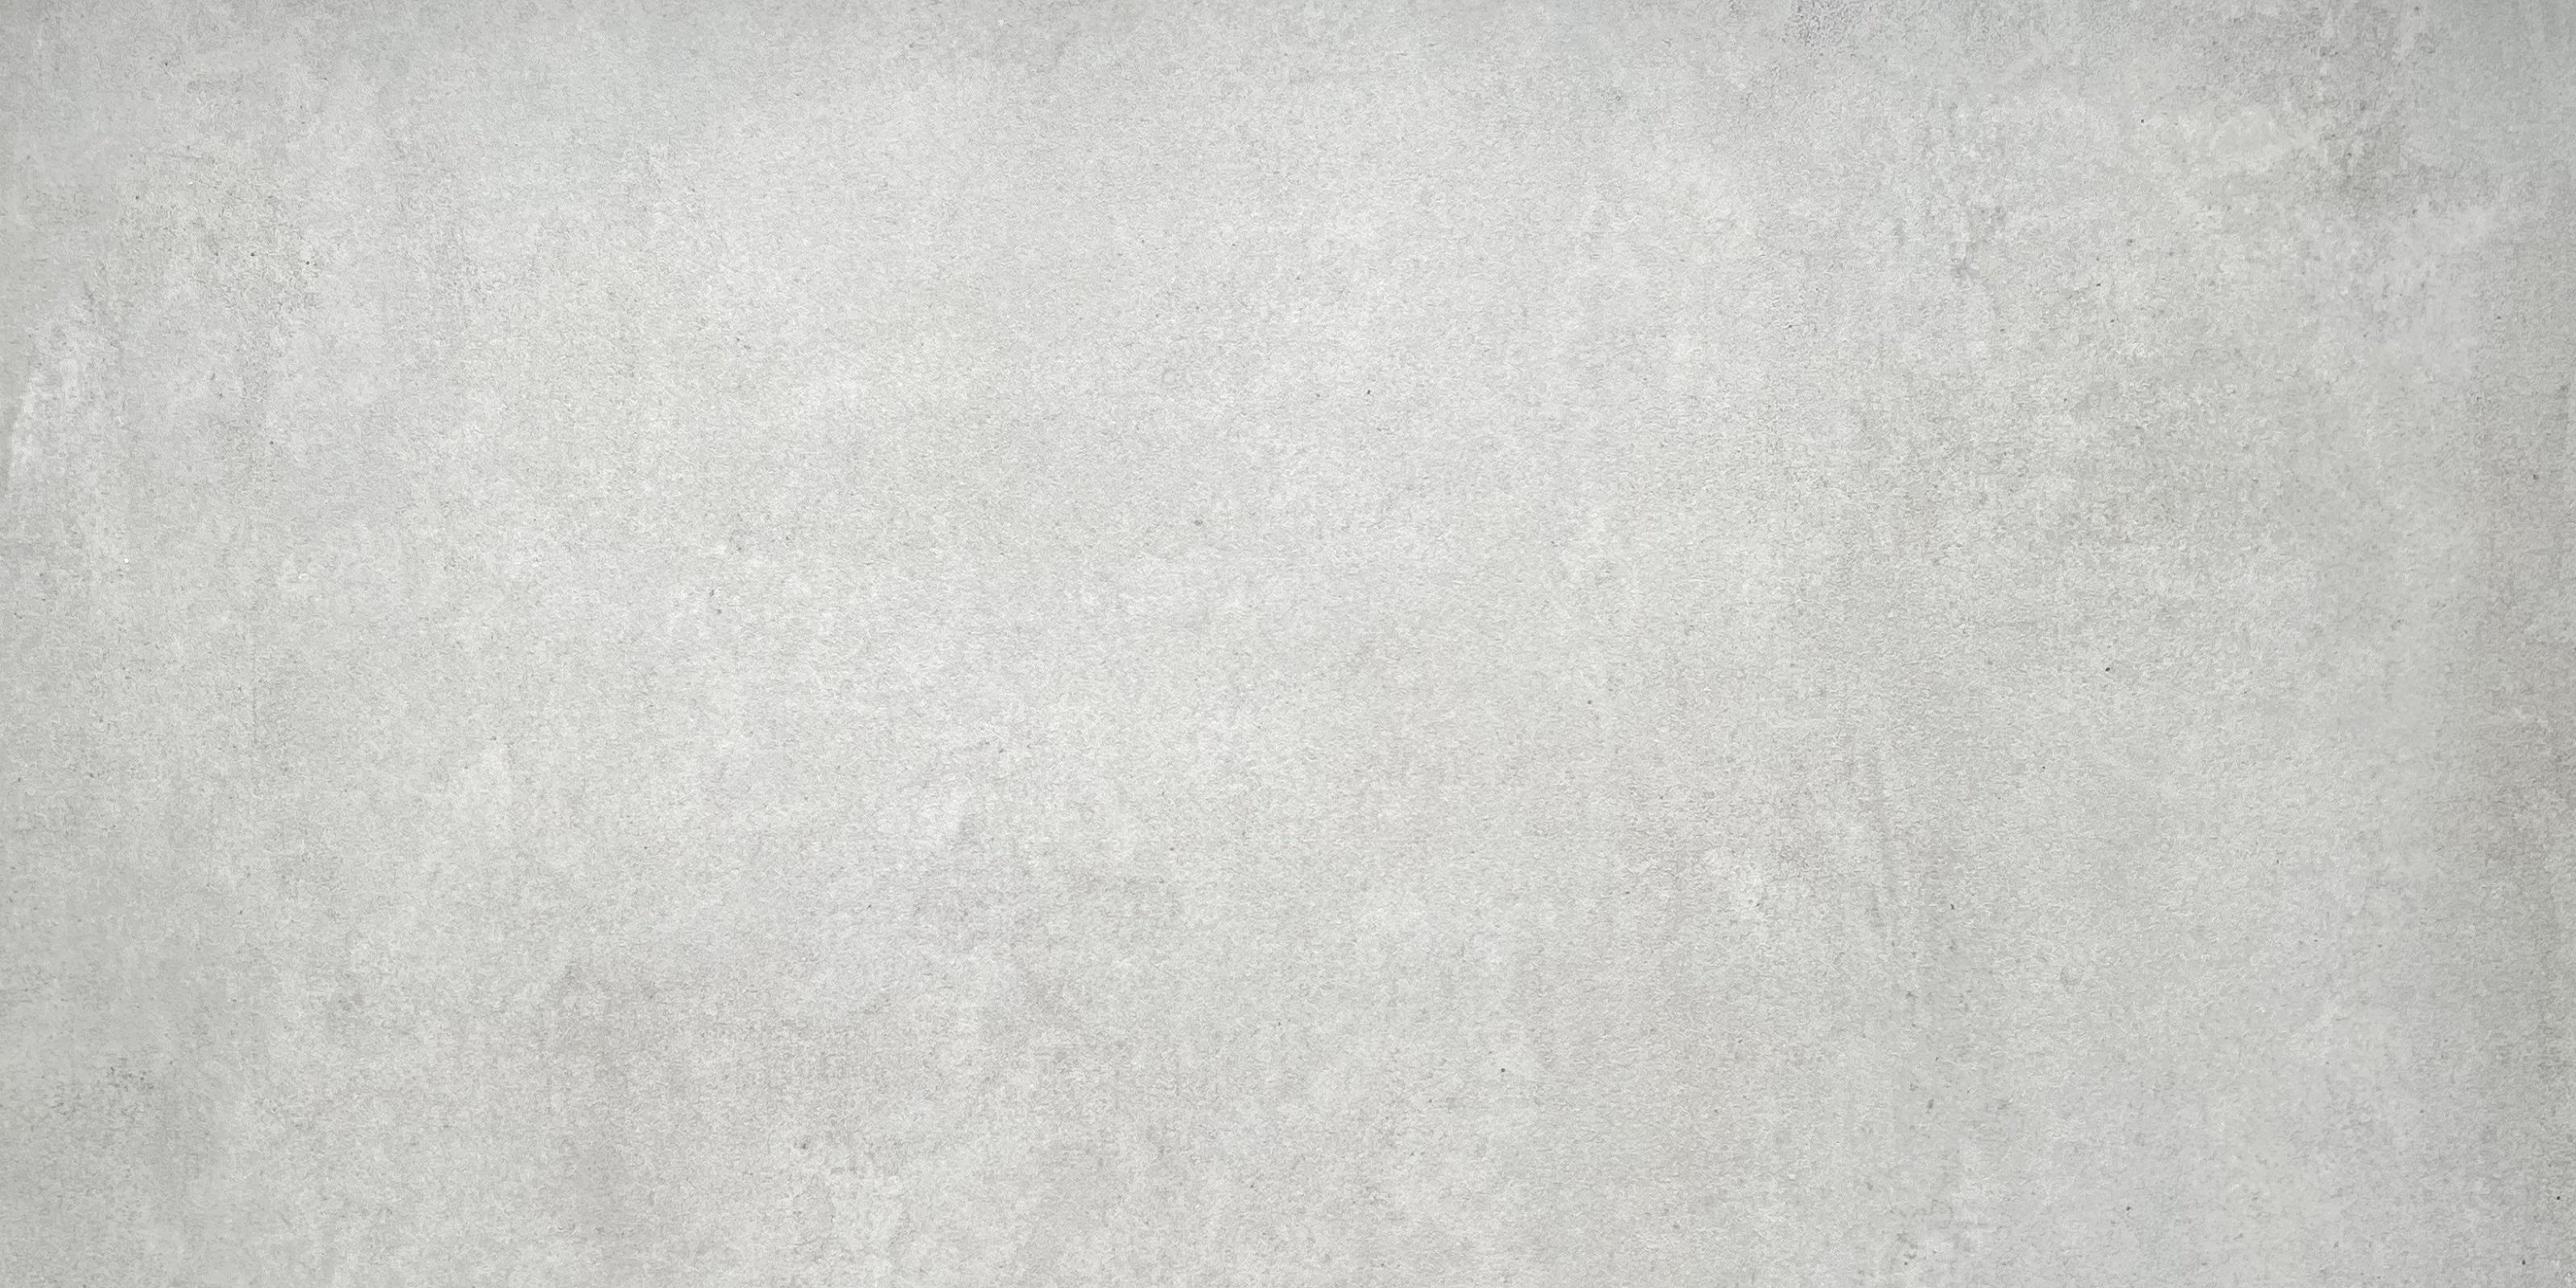 Osmose Ecoline Grau 30x60cm Bodenfliese R10